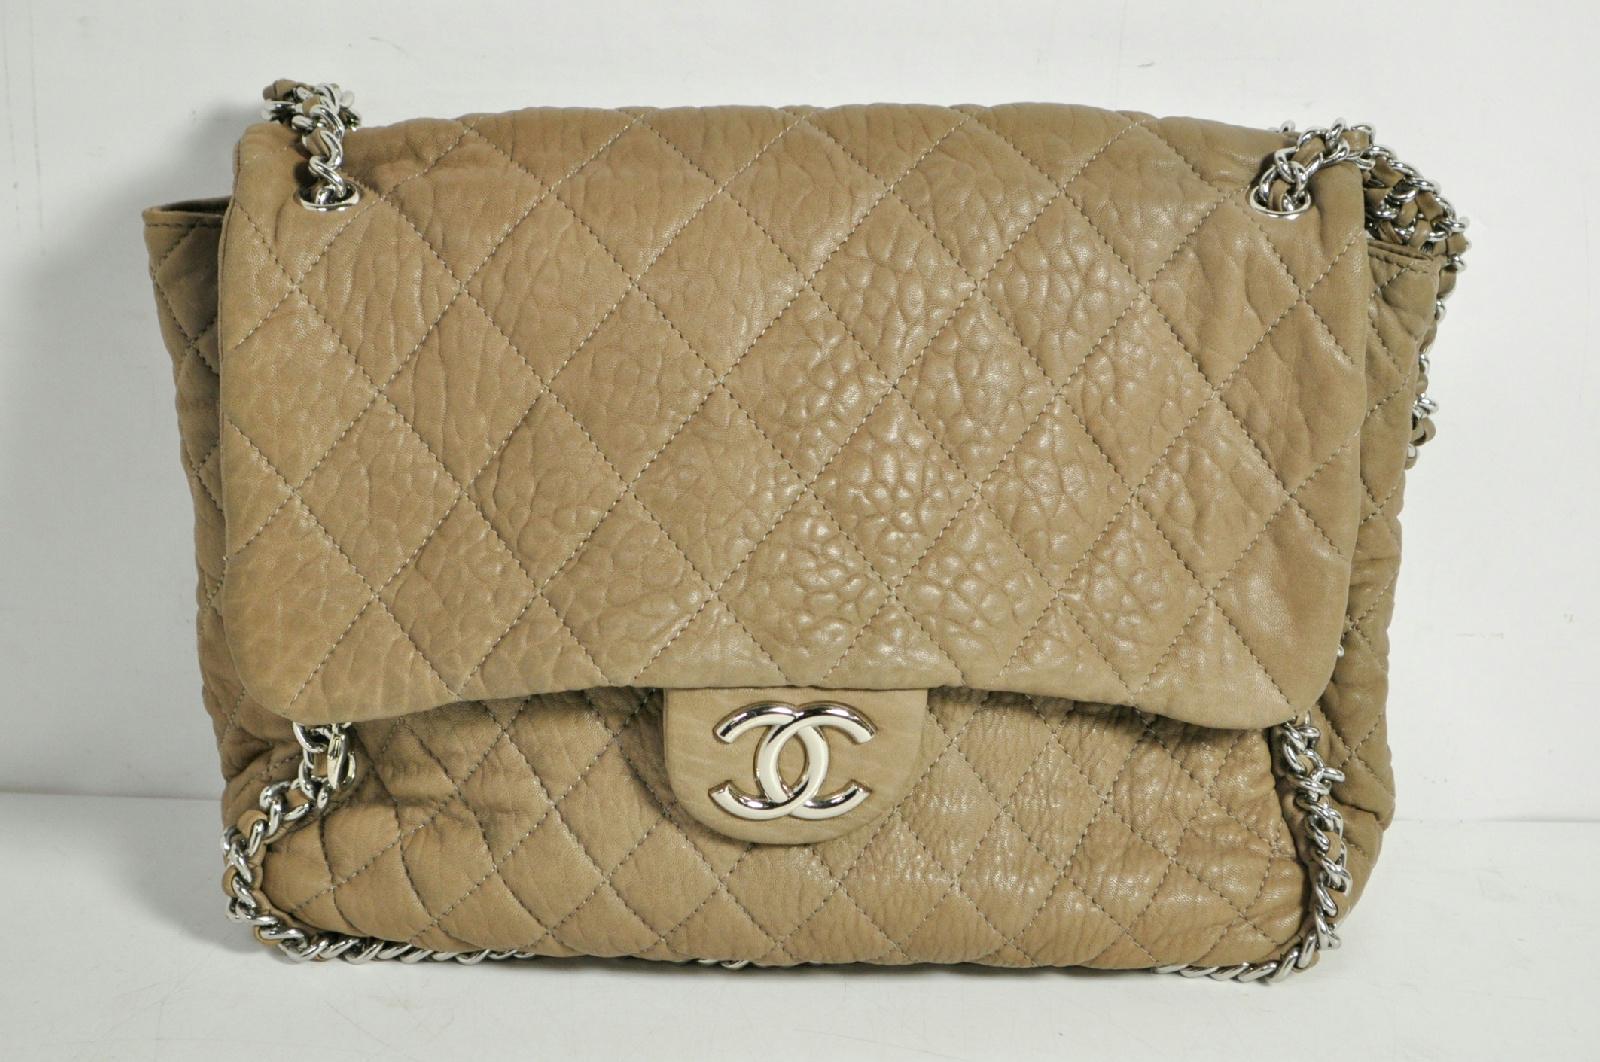 bf03ad8c904d Chanel Beige Lambskin Handbag   Stanford Center for Opportunity ...